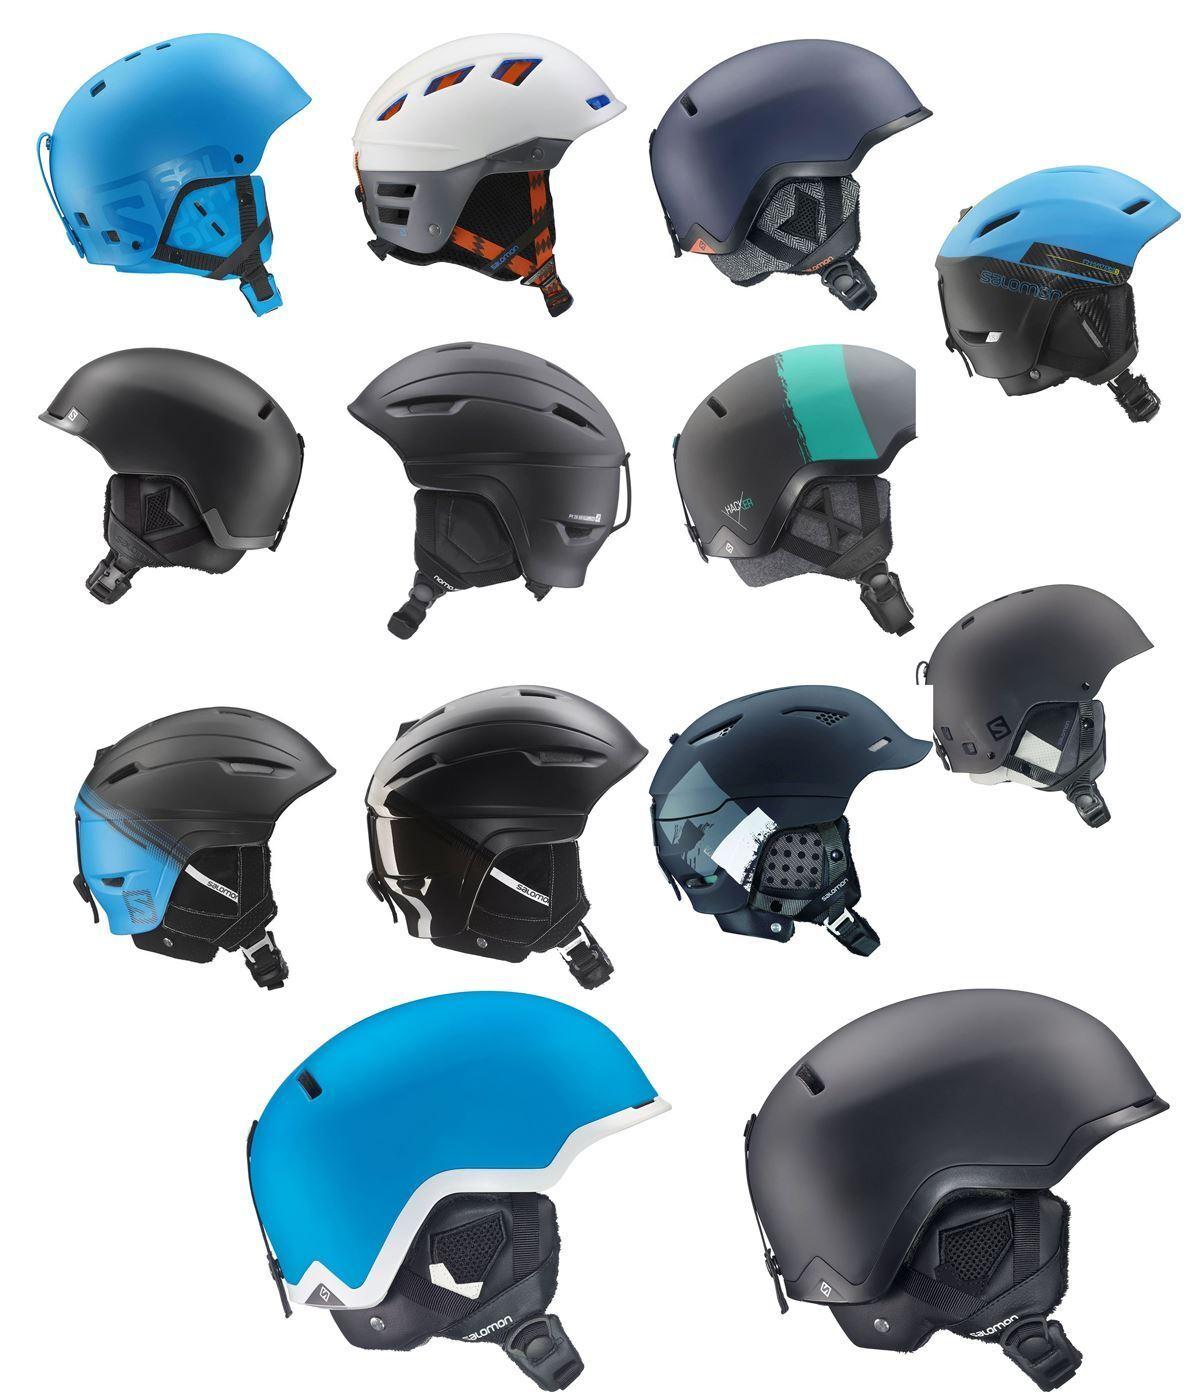 Salomon Men's Snow Ski Snowboard Helmet All Sizes colors Styles  New  up to 50% off